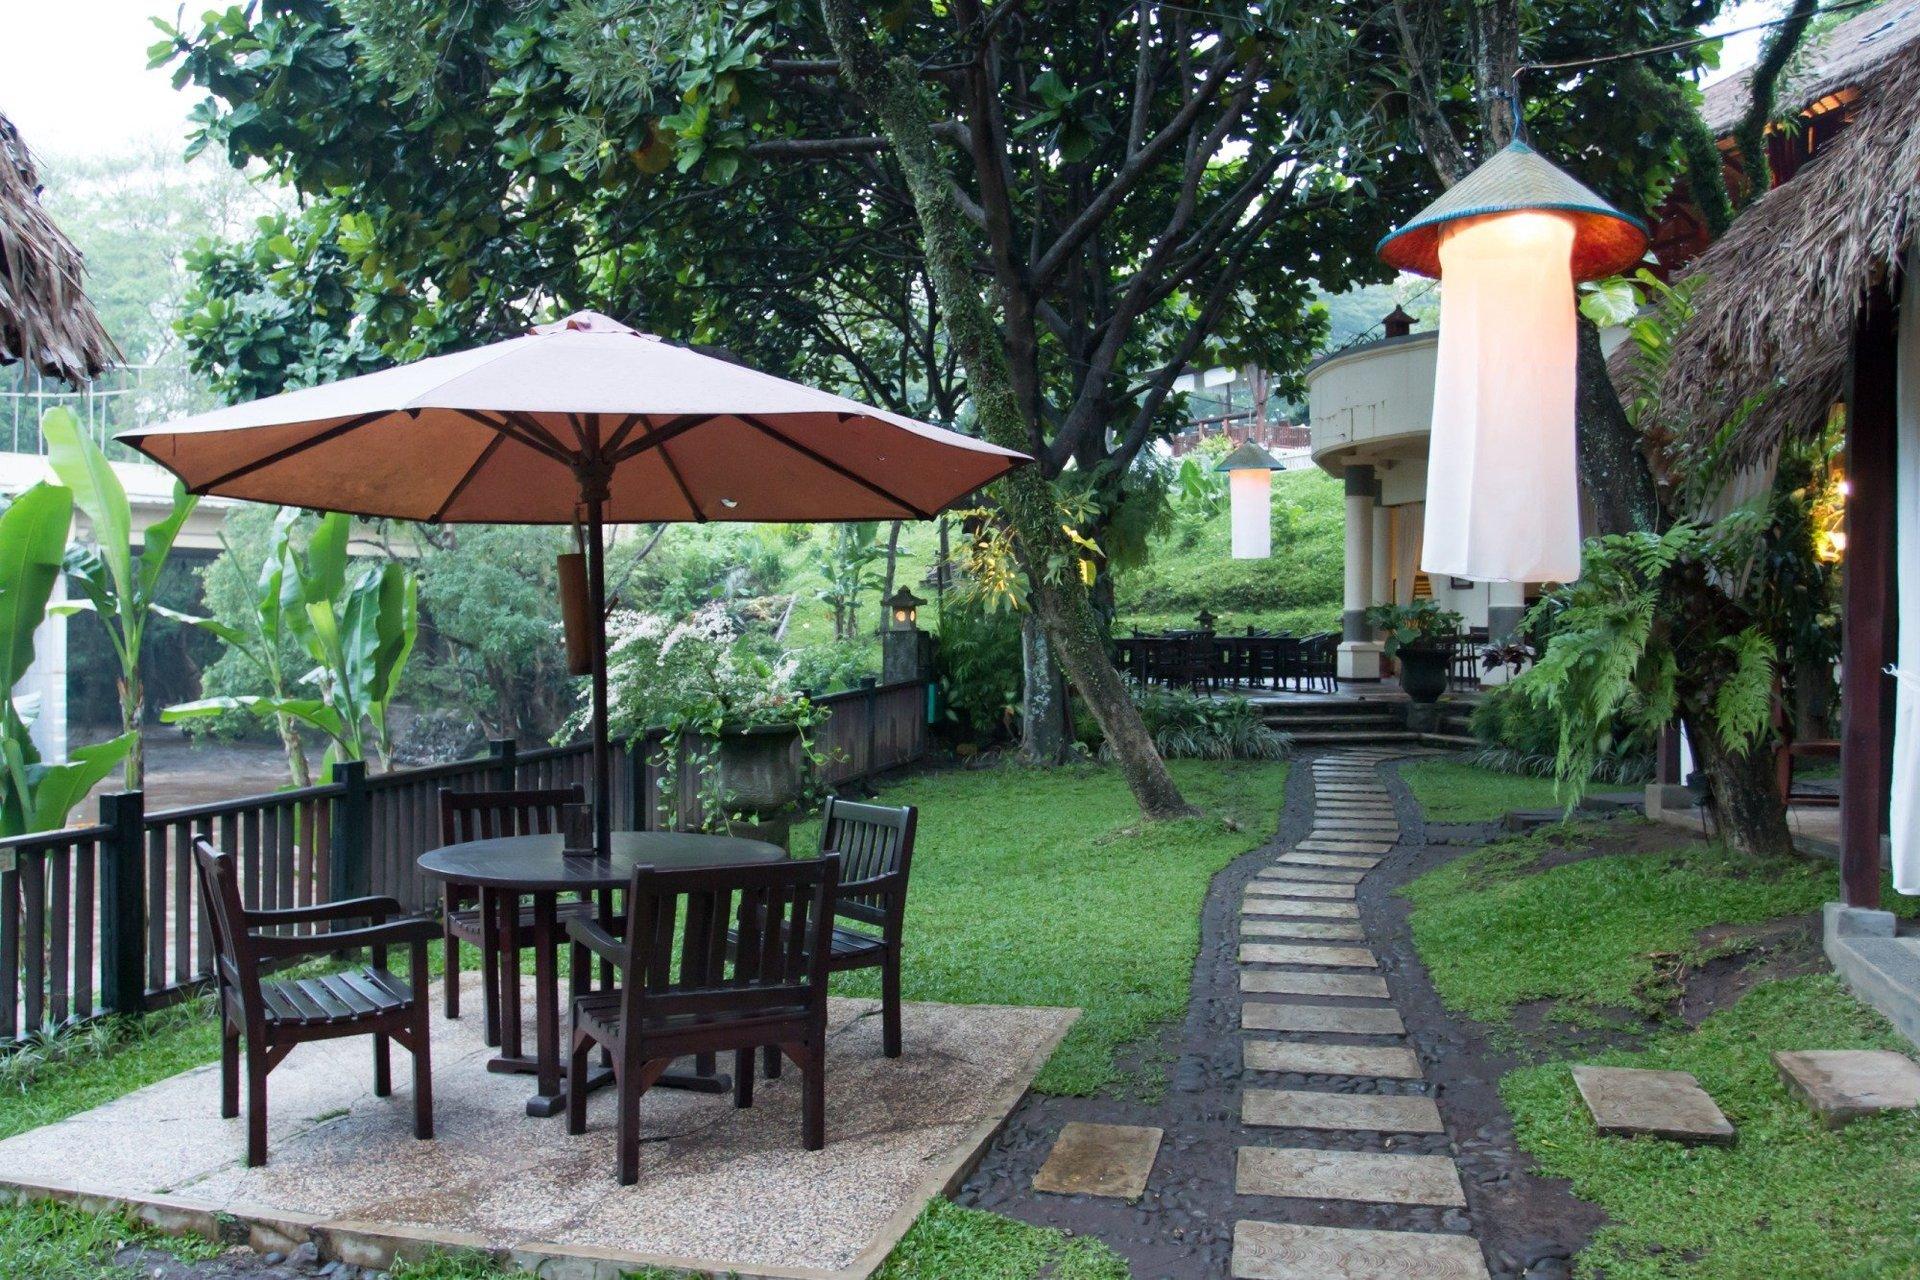 Tavolini giugliano in campania na arredo giardino for Arredo giardino